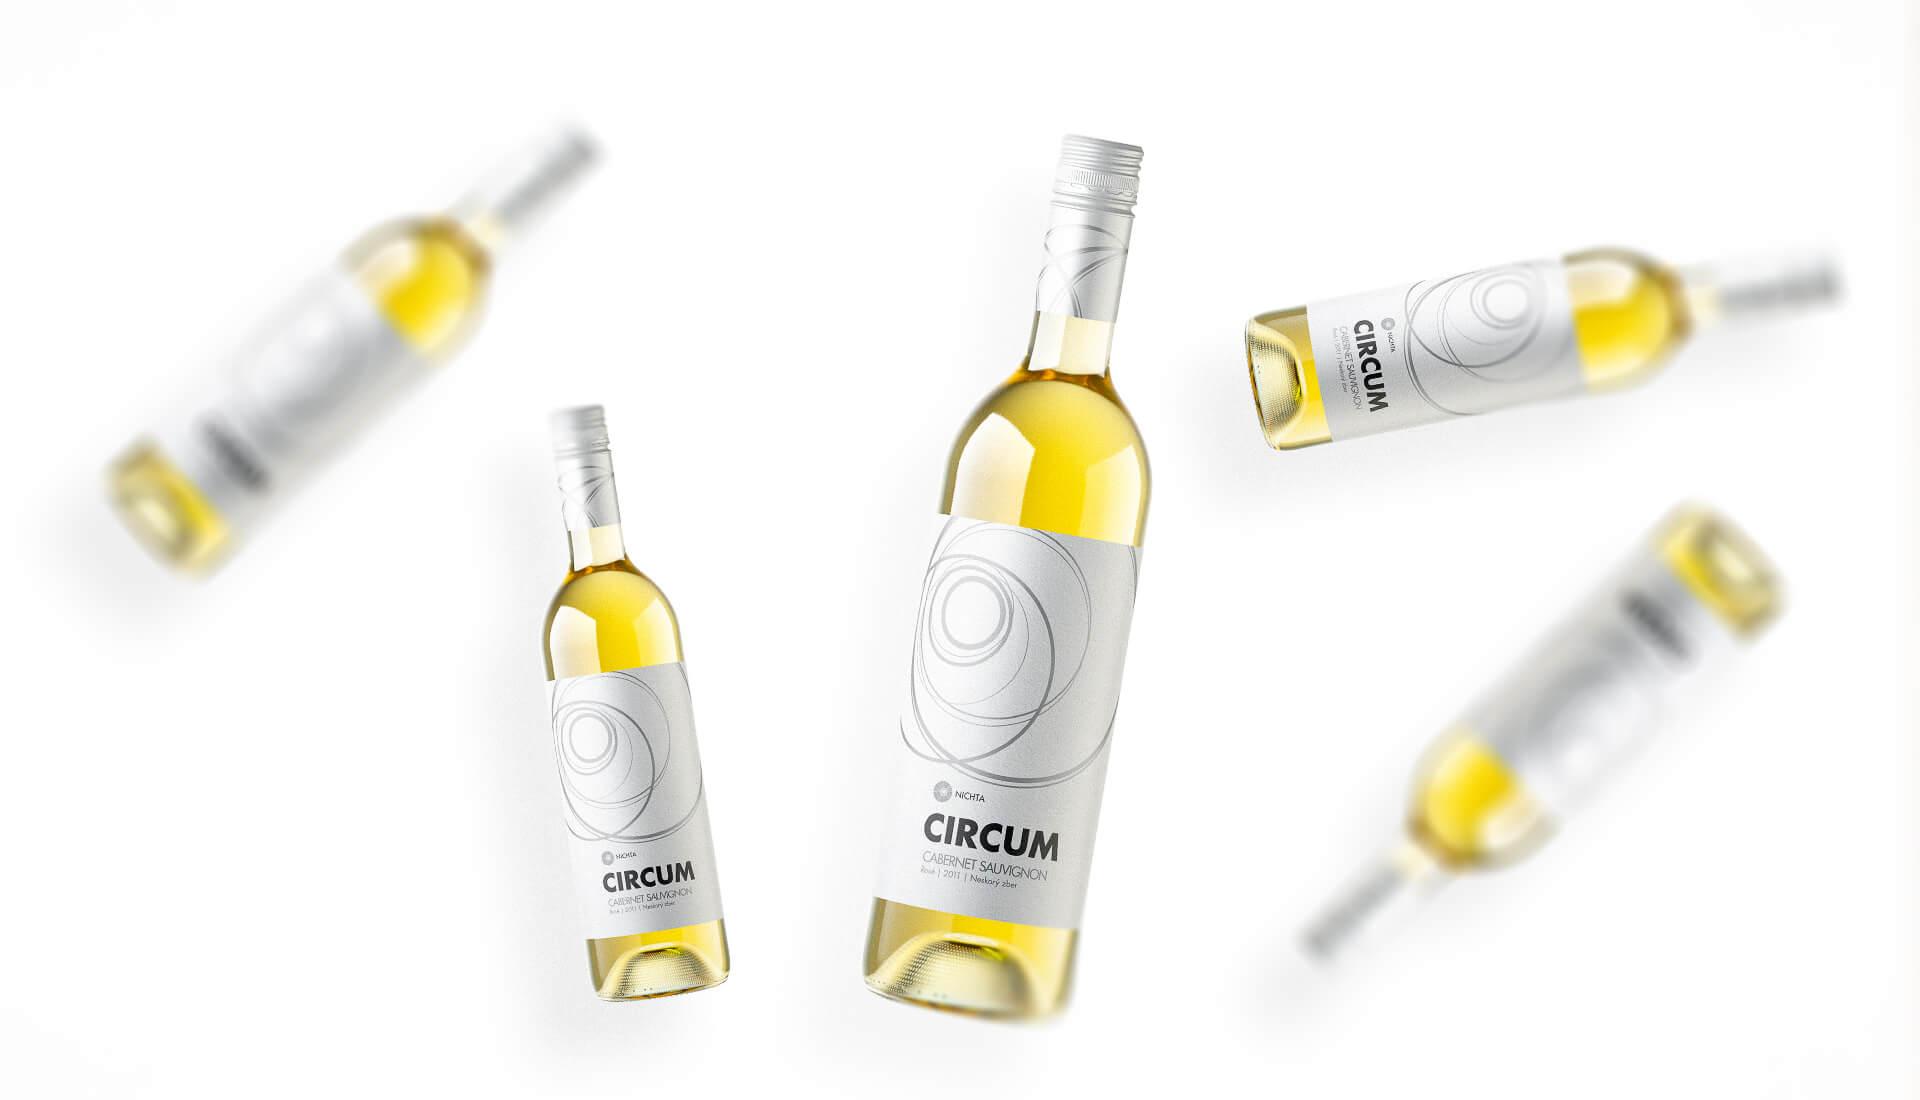 Etiketa na víno obalový dizajn NICHTA CIRCUM biele víno